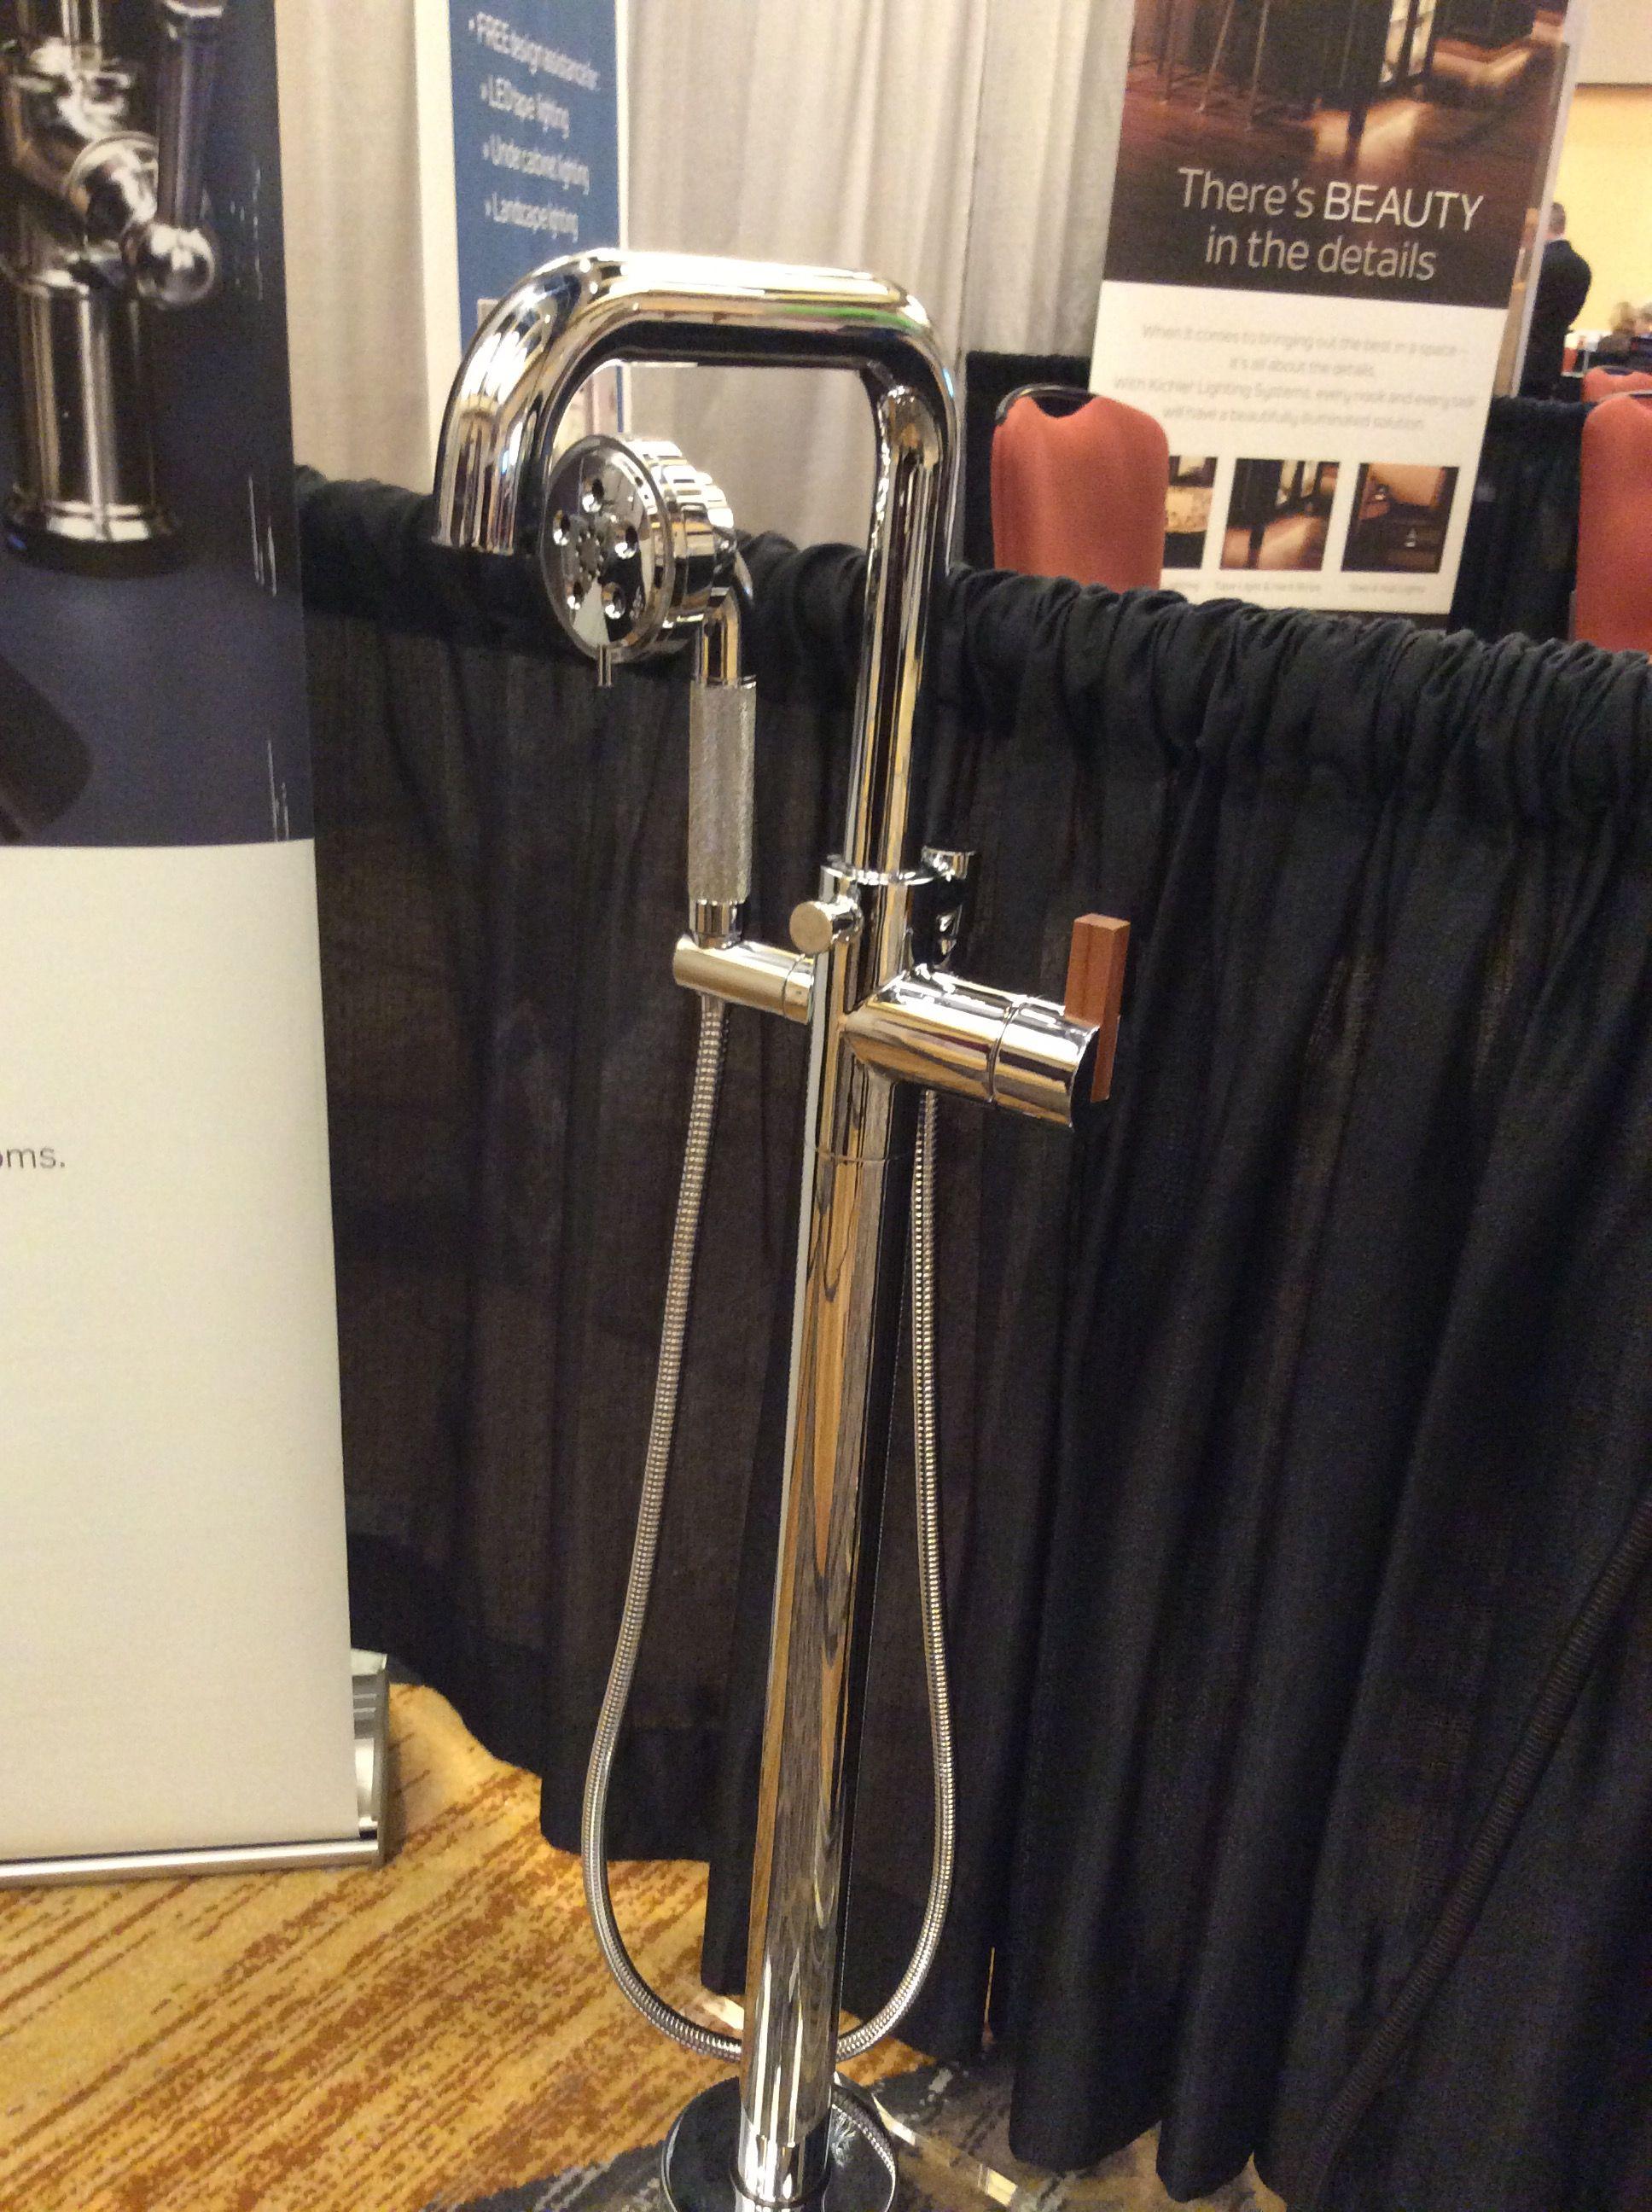 Brizo Litze Freestanding Tub Filler With Teak Handle Brizo Freestanding Tub Filler Free Standing Tub